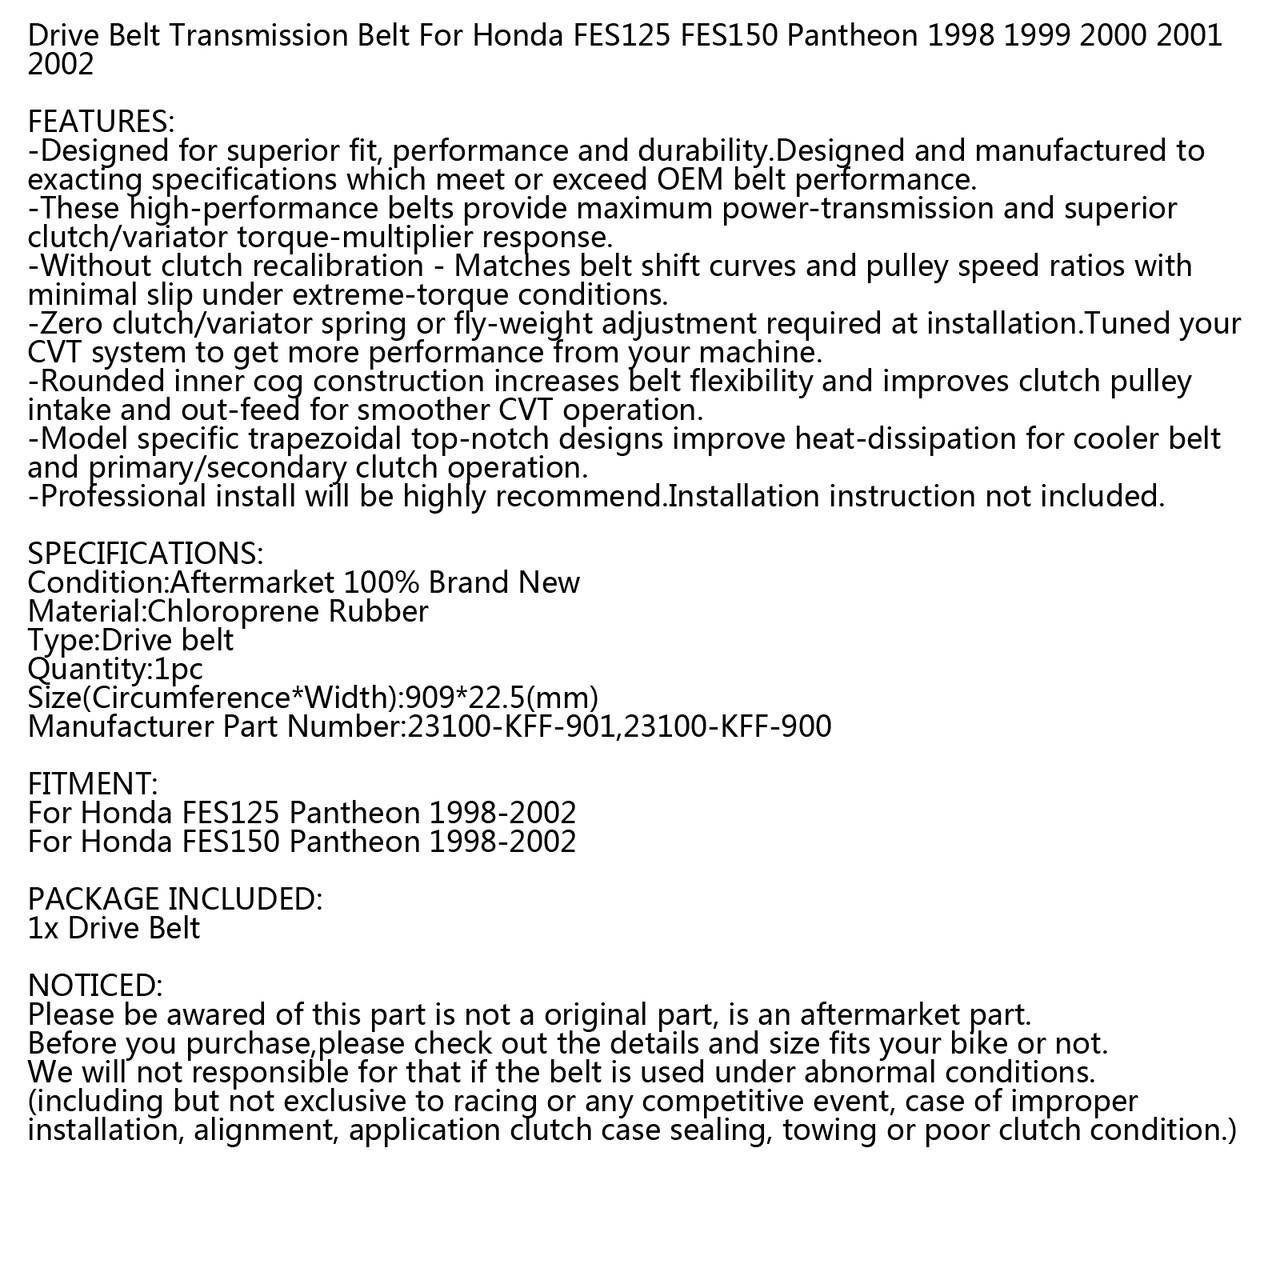 Drive Belt For Honda FES125 Pantheon FES150 1998-2002